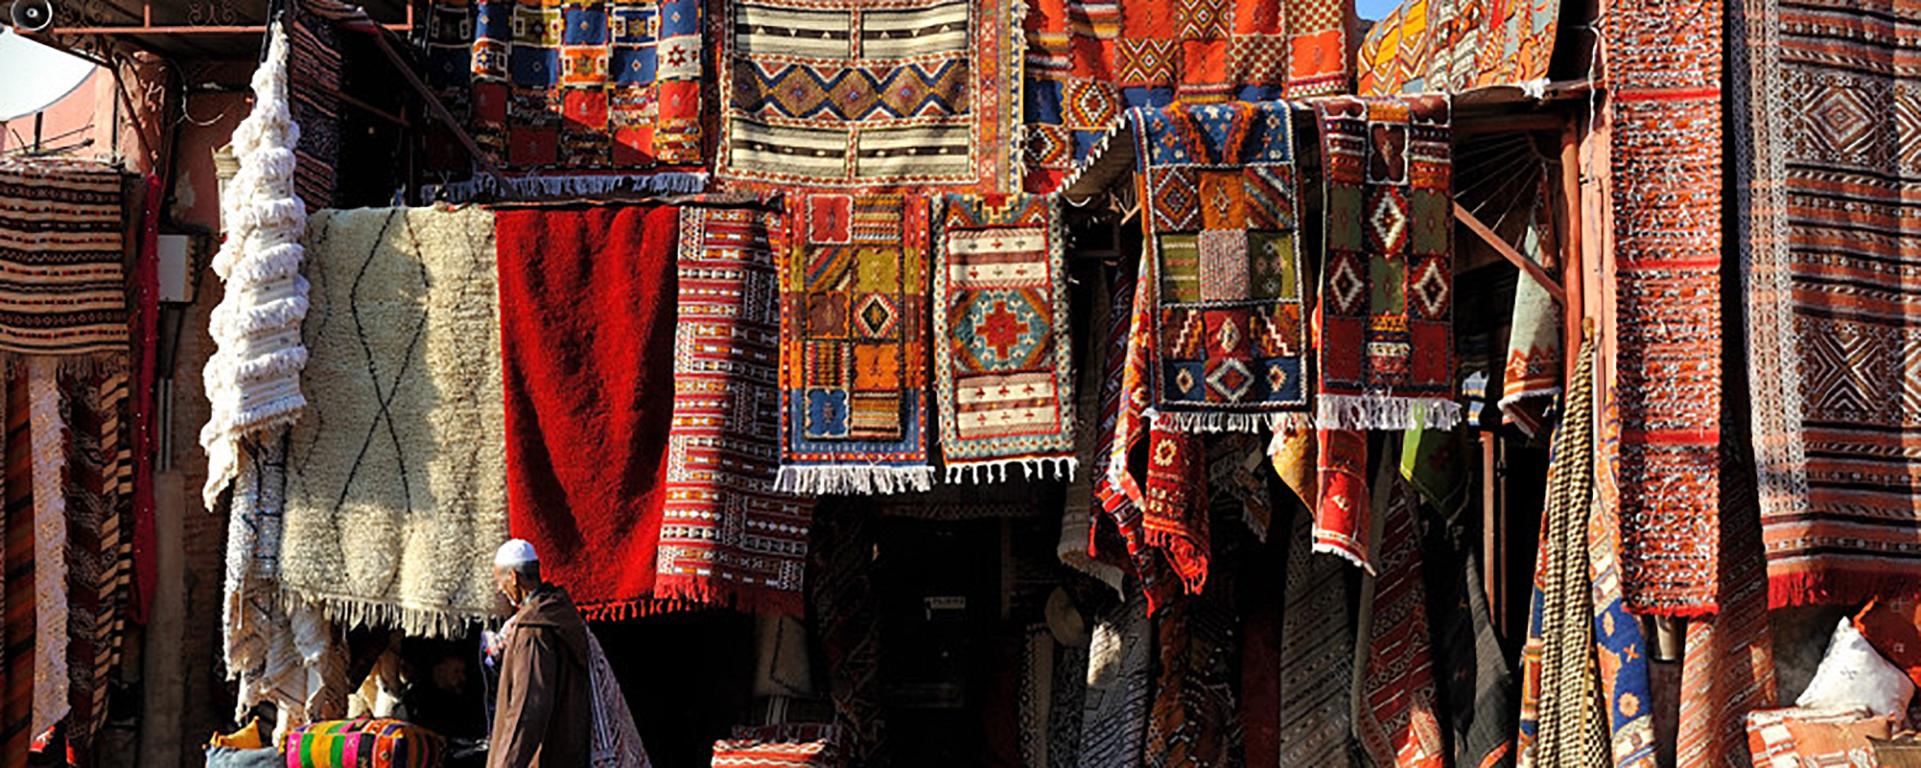 Rahba Kedima market square, Marrakech, Morocco 1202-419